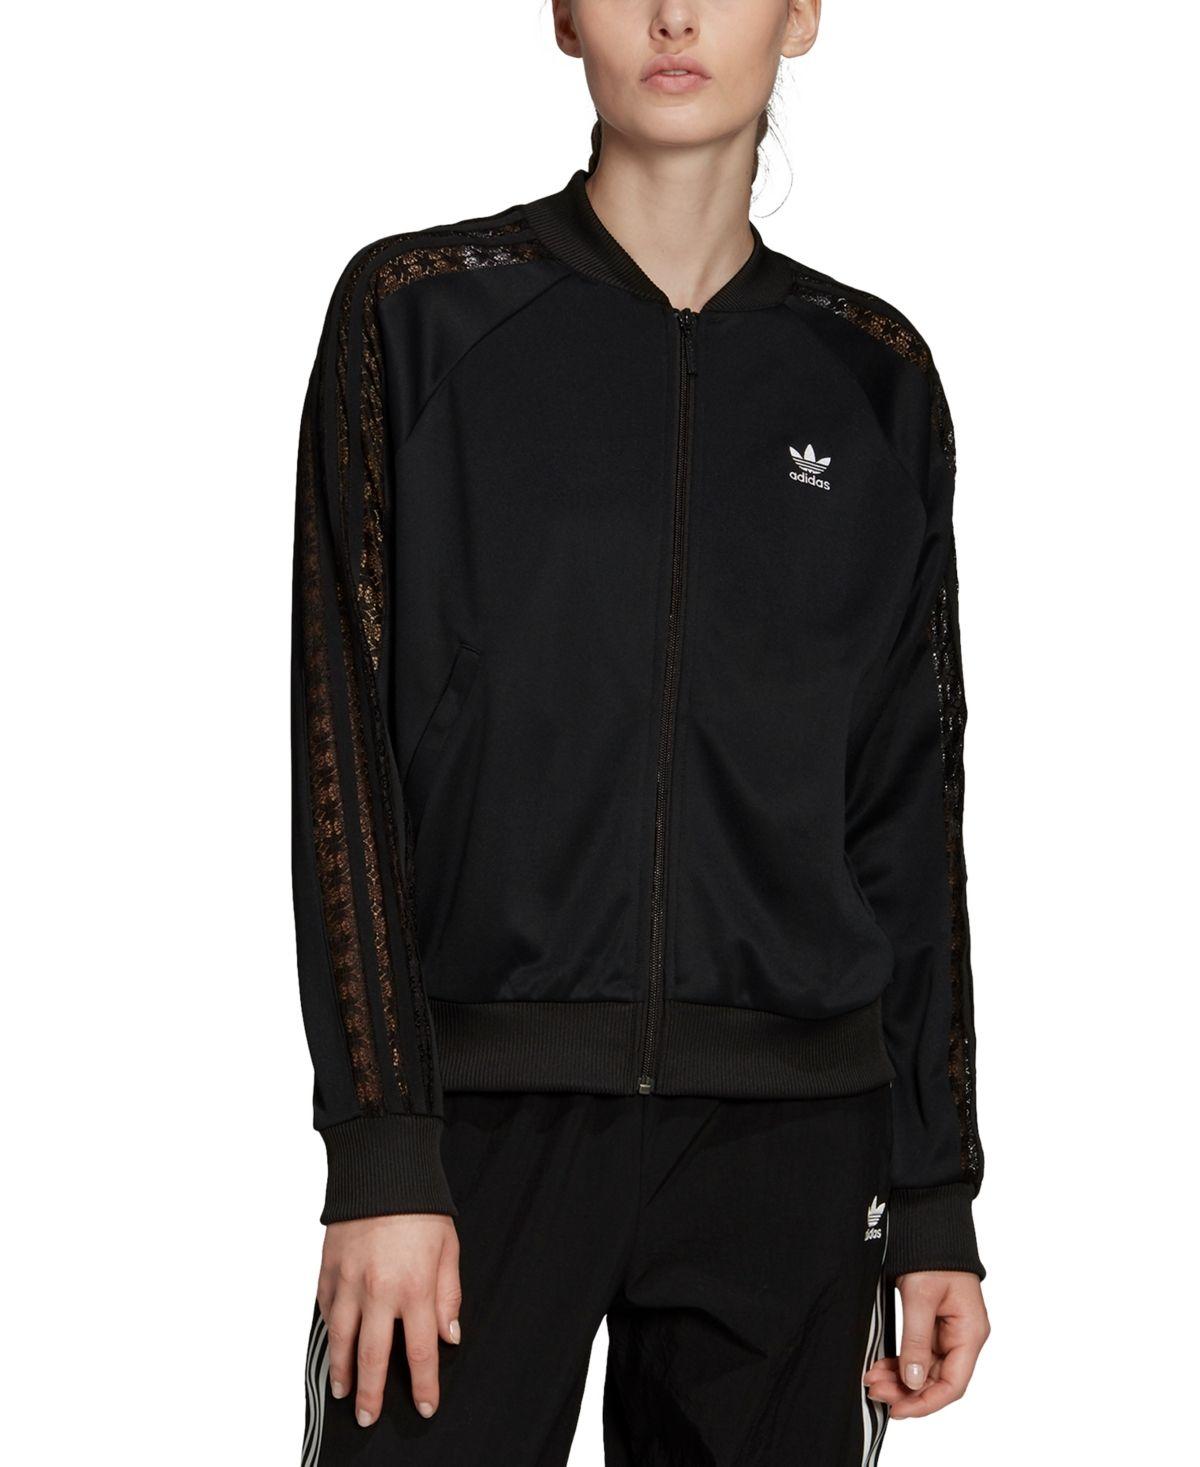 Adidas Jacket: Shop Adidas Jacket Macy's